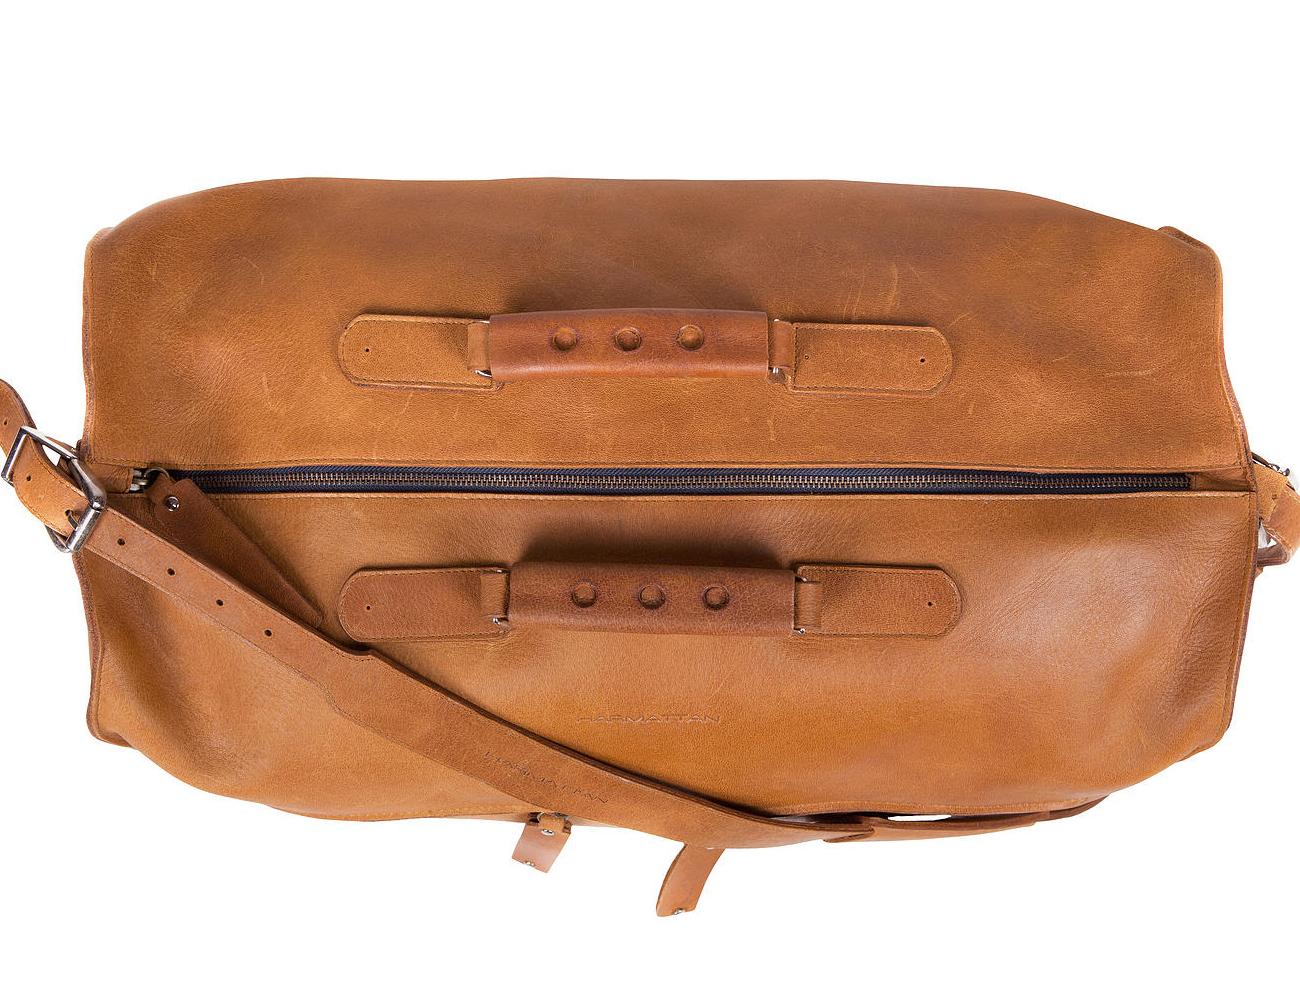 The Traveler Bag by Harmattan